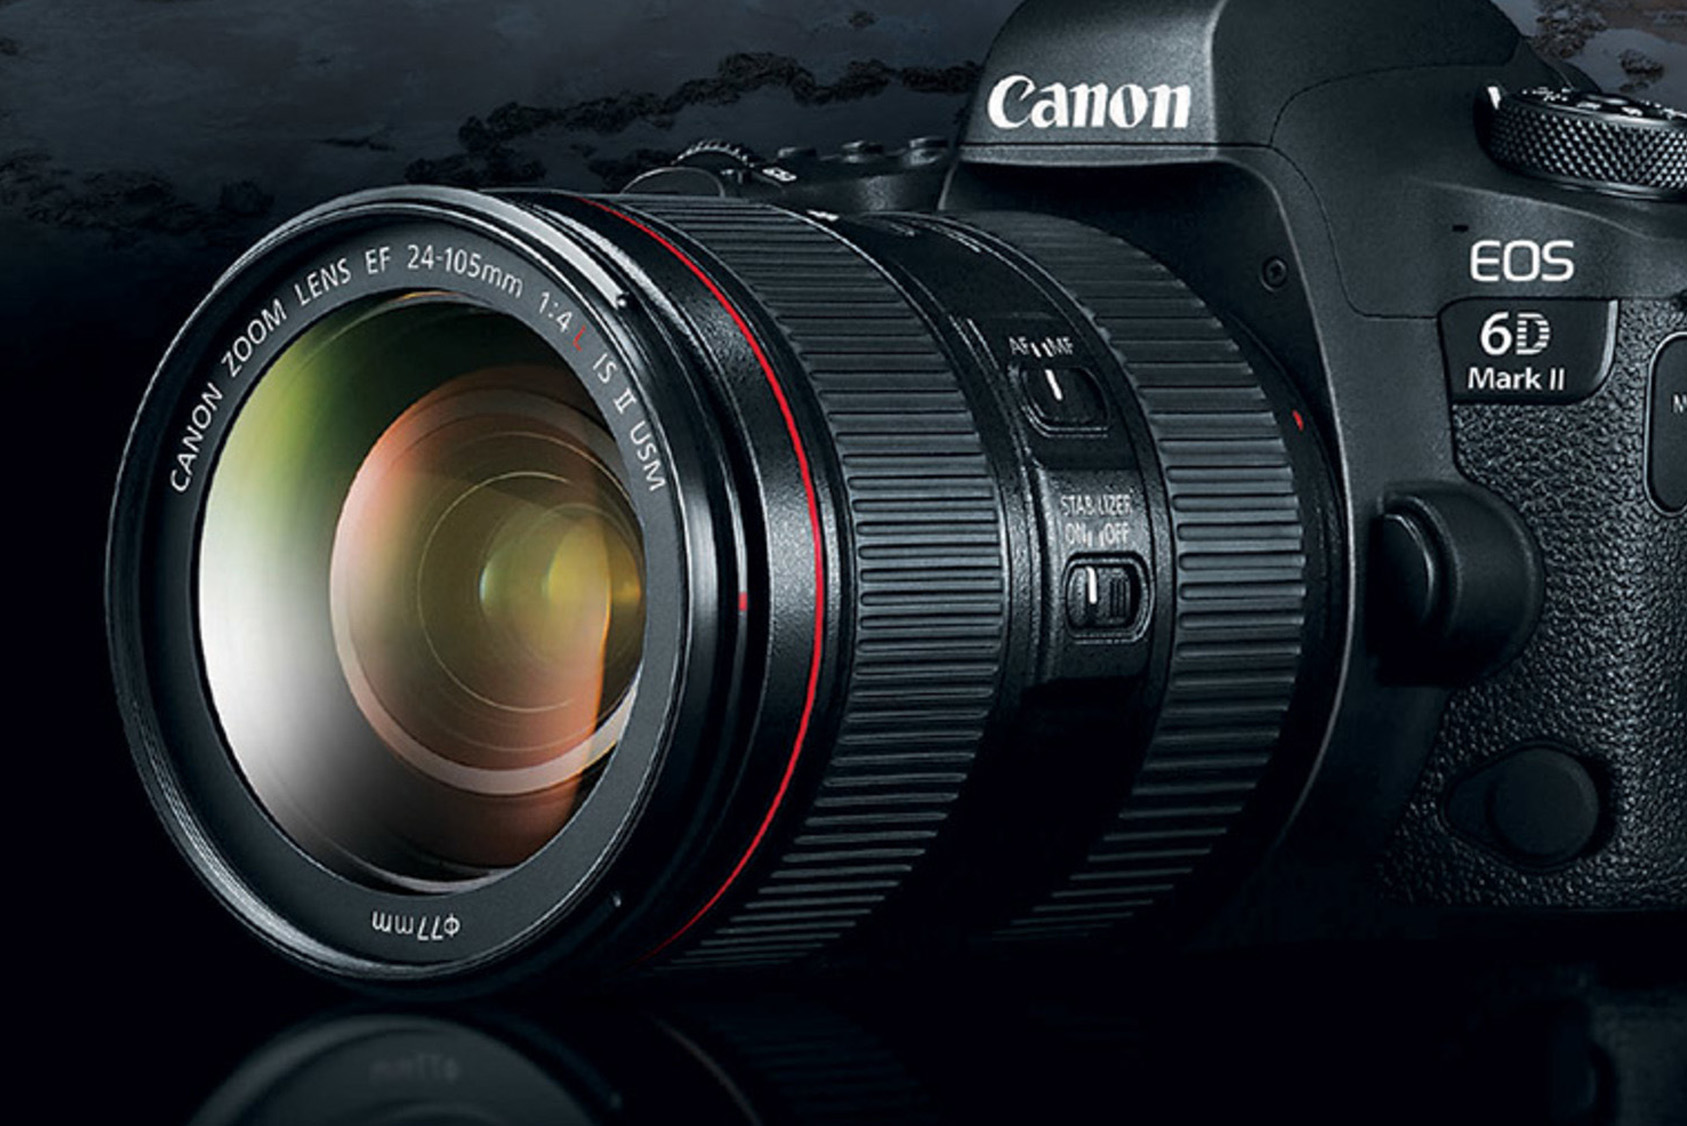 Canon EOS 6D Mark II 24-105 F4 IS L USM II